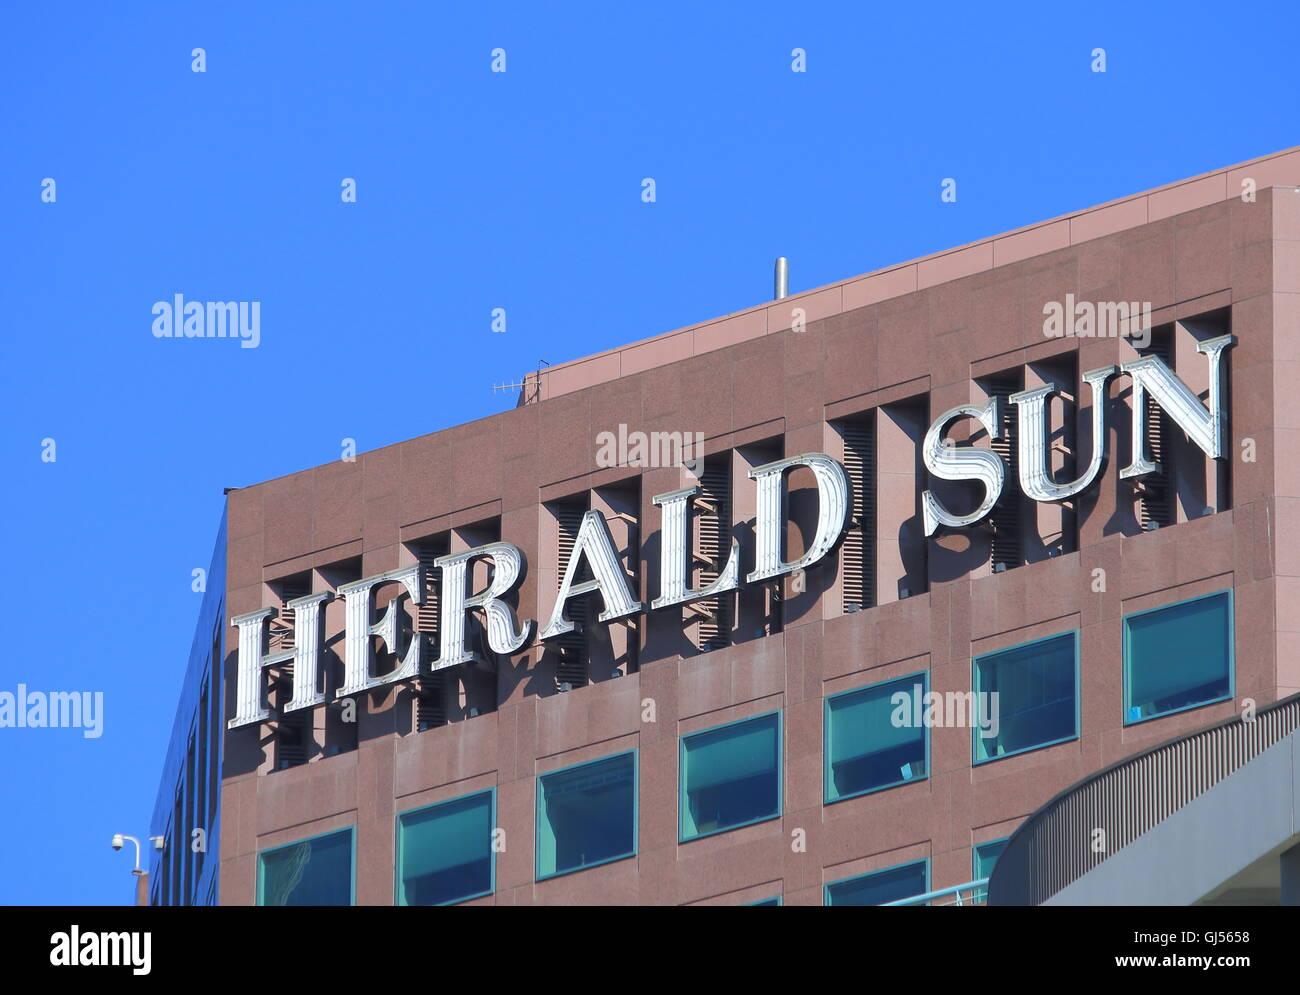 Herald Sun newspaper logo , morning tabloid newspaper based in Melbourne Australia. Stock Photo